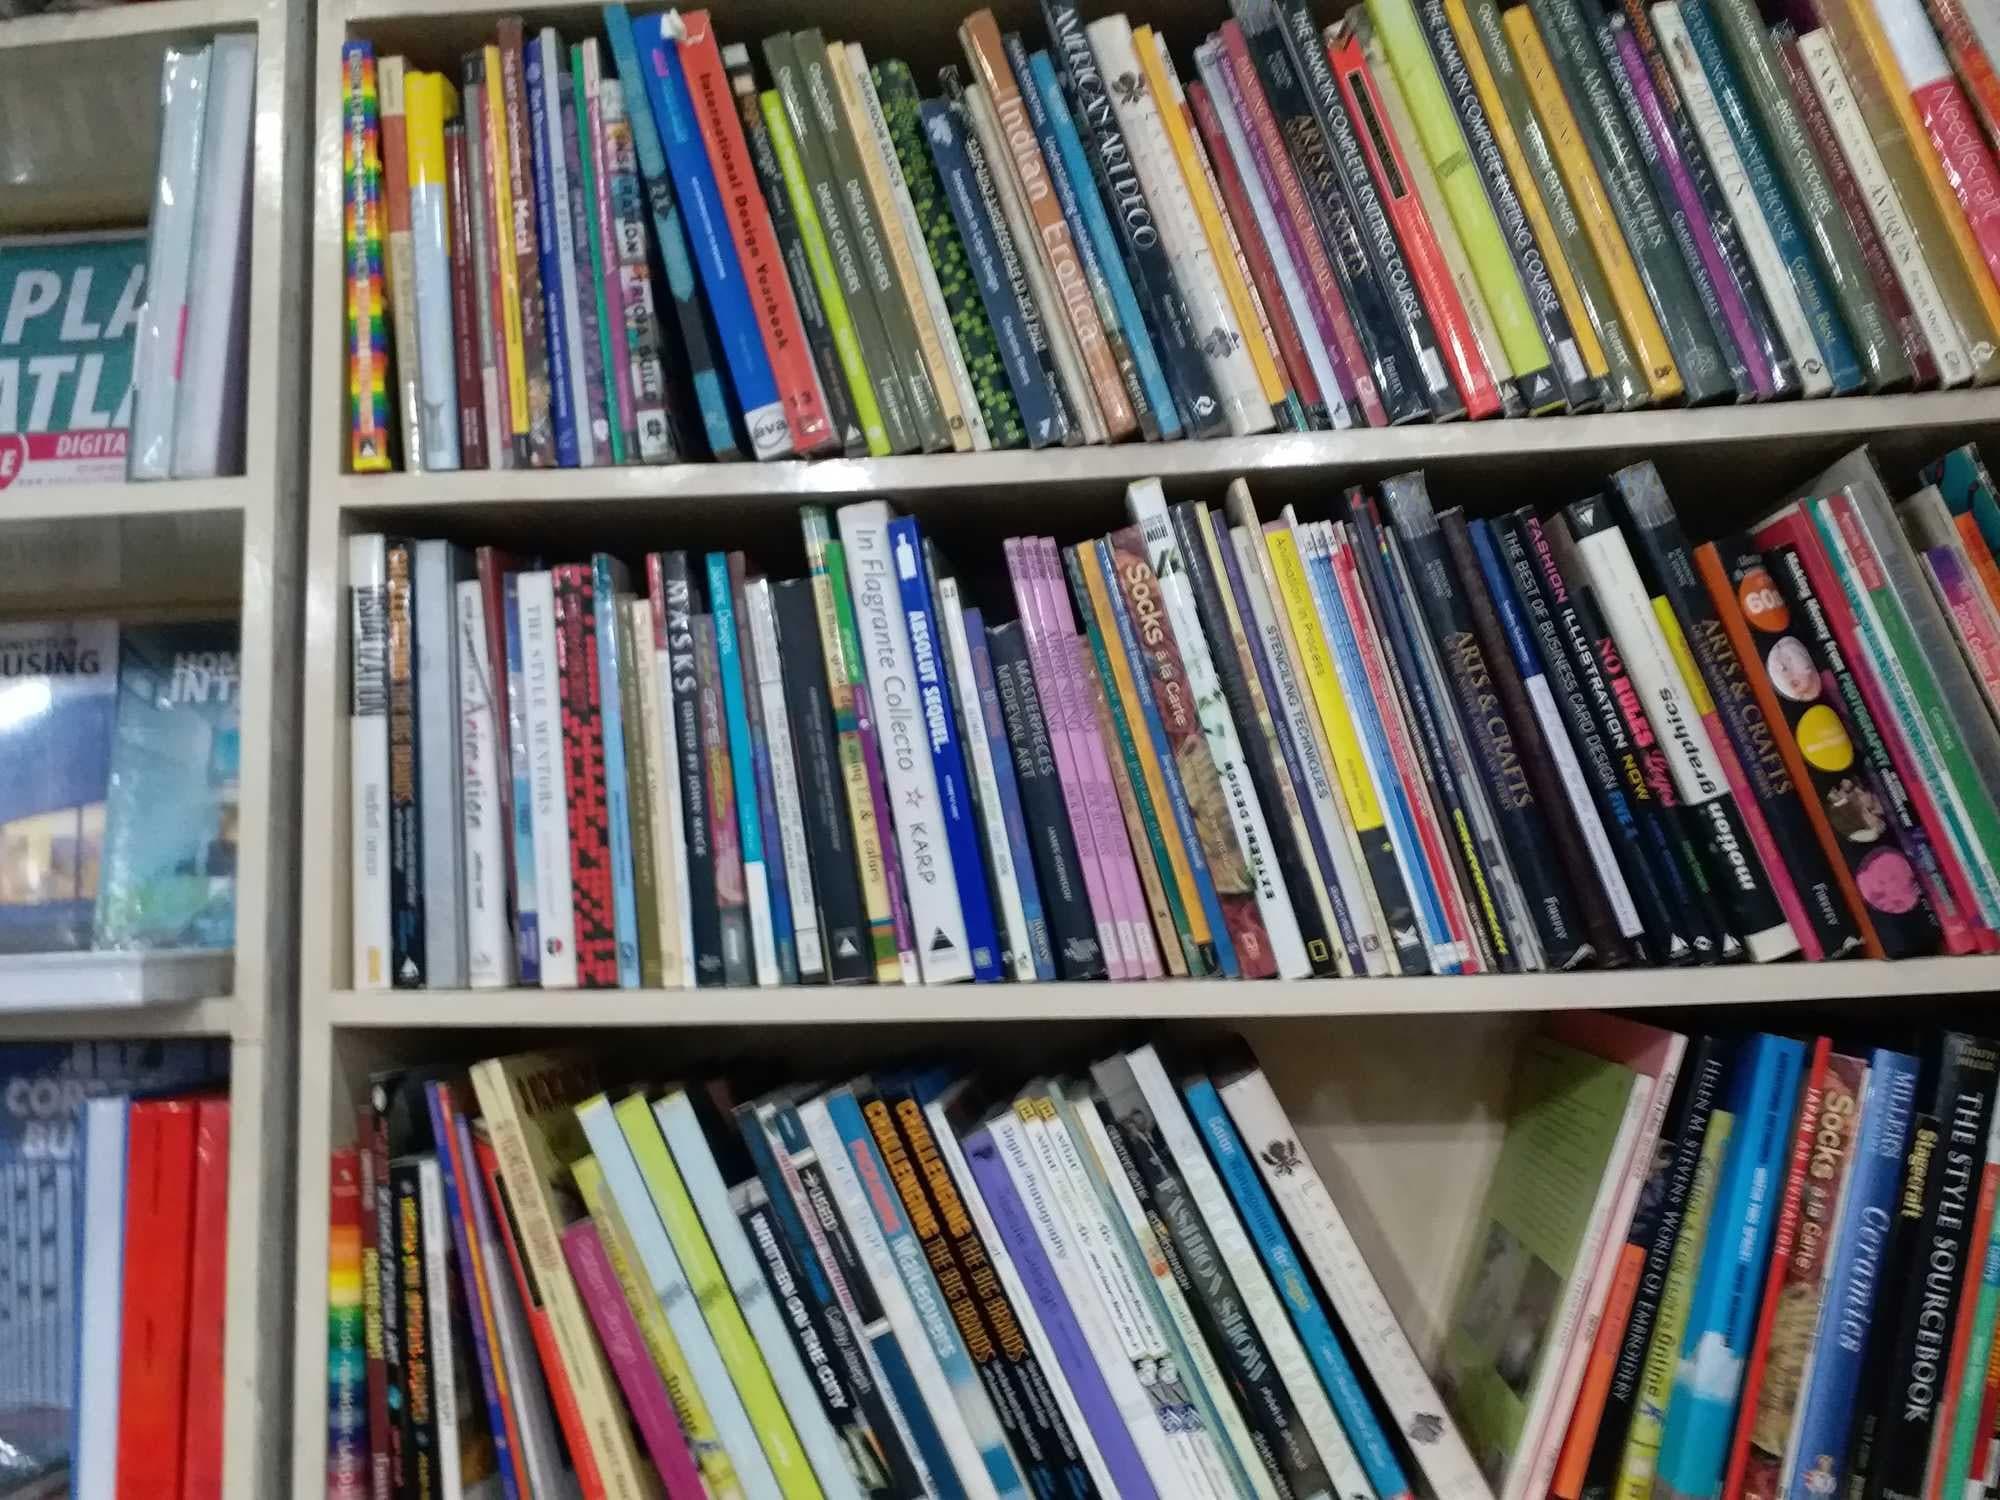 Top 100 Best Bookstores in Coimbatore - Best Book shops - Justdial